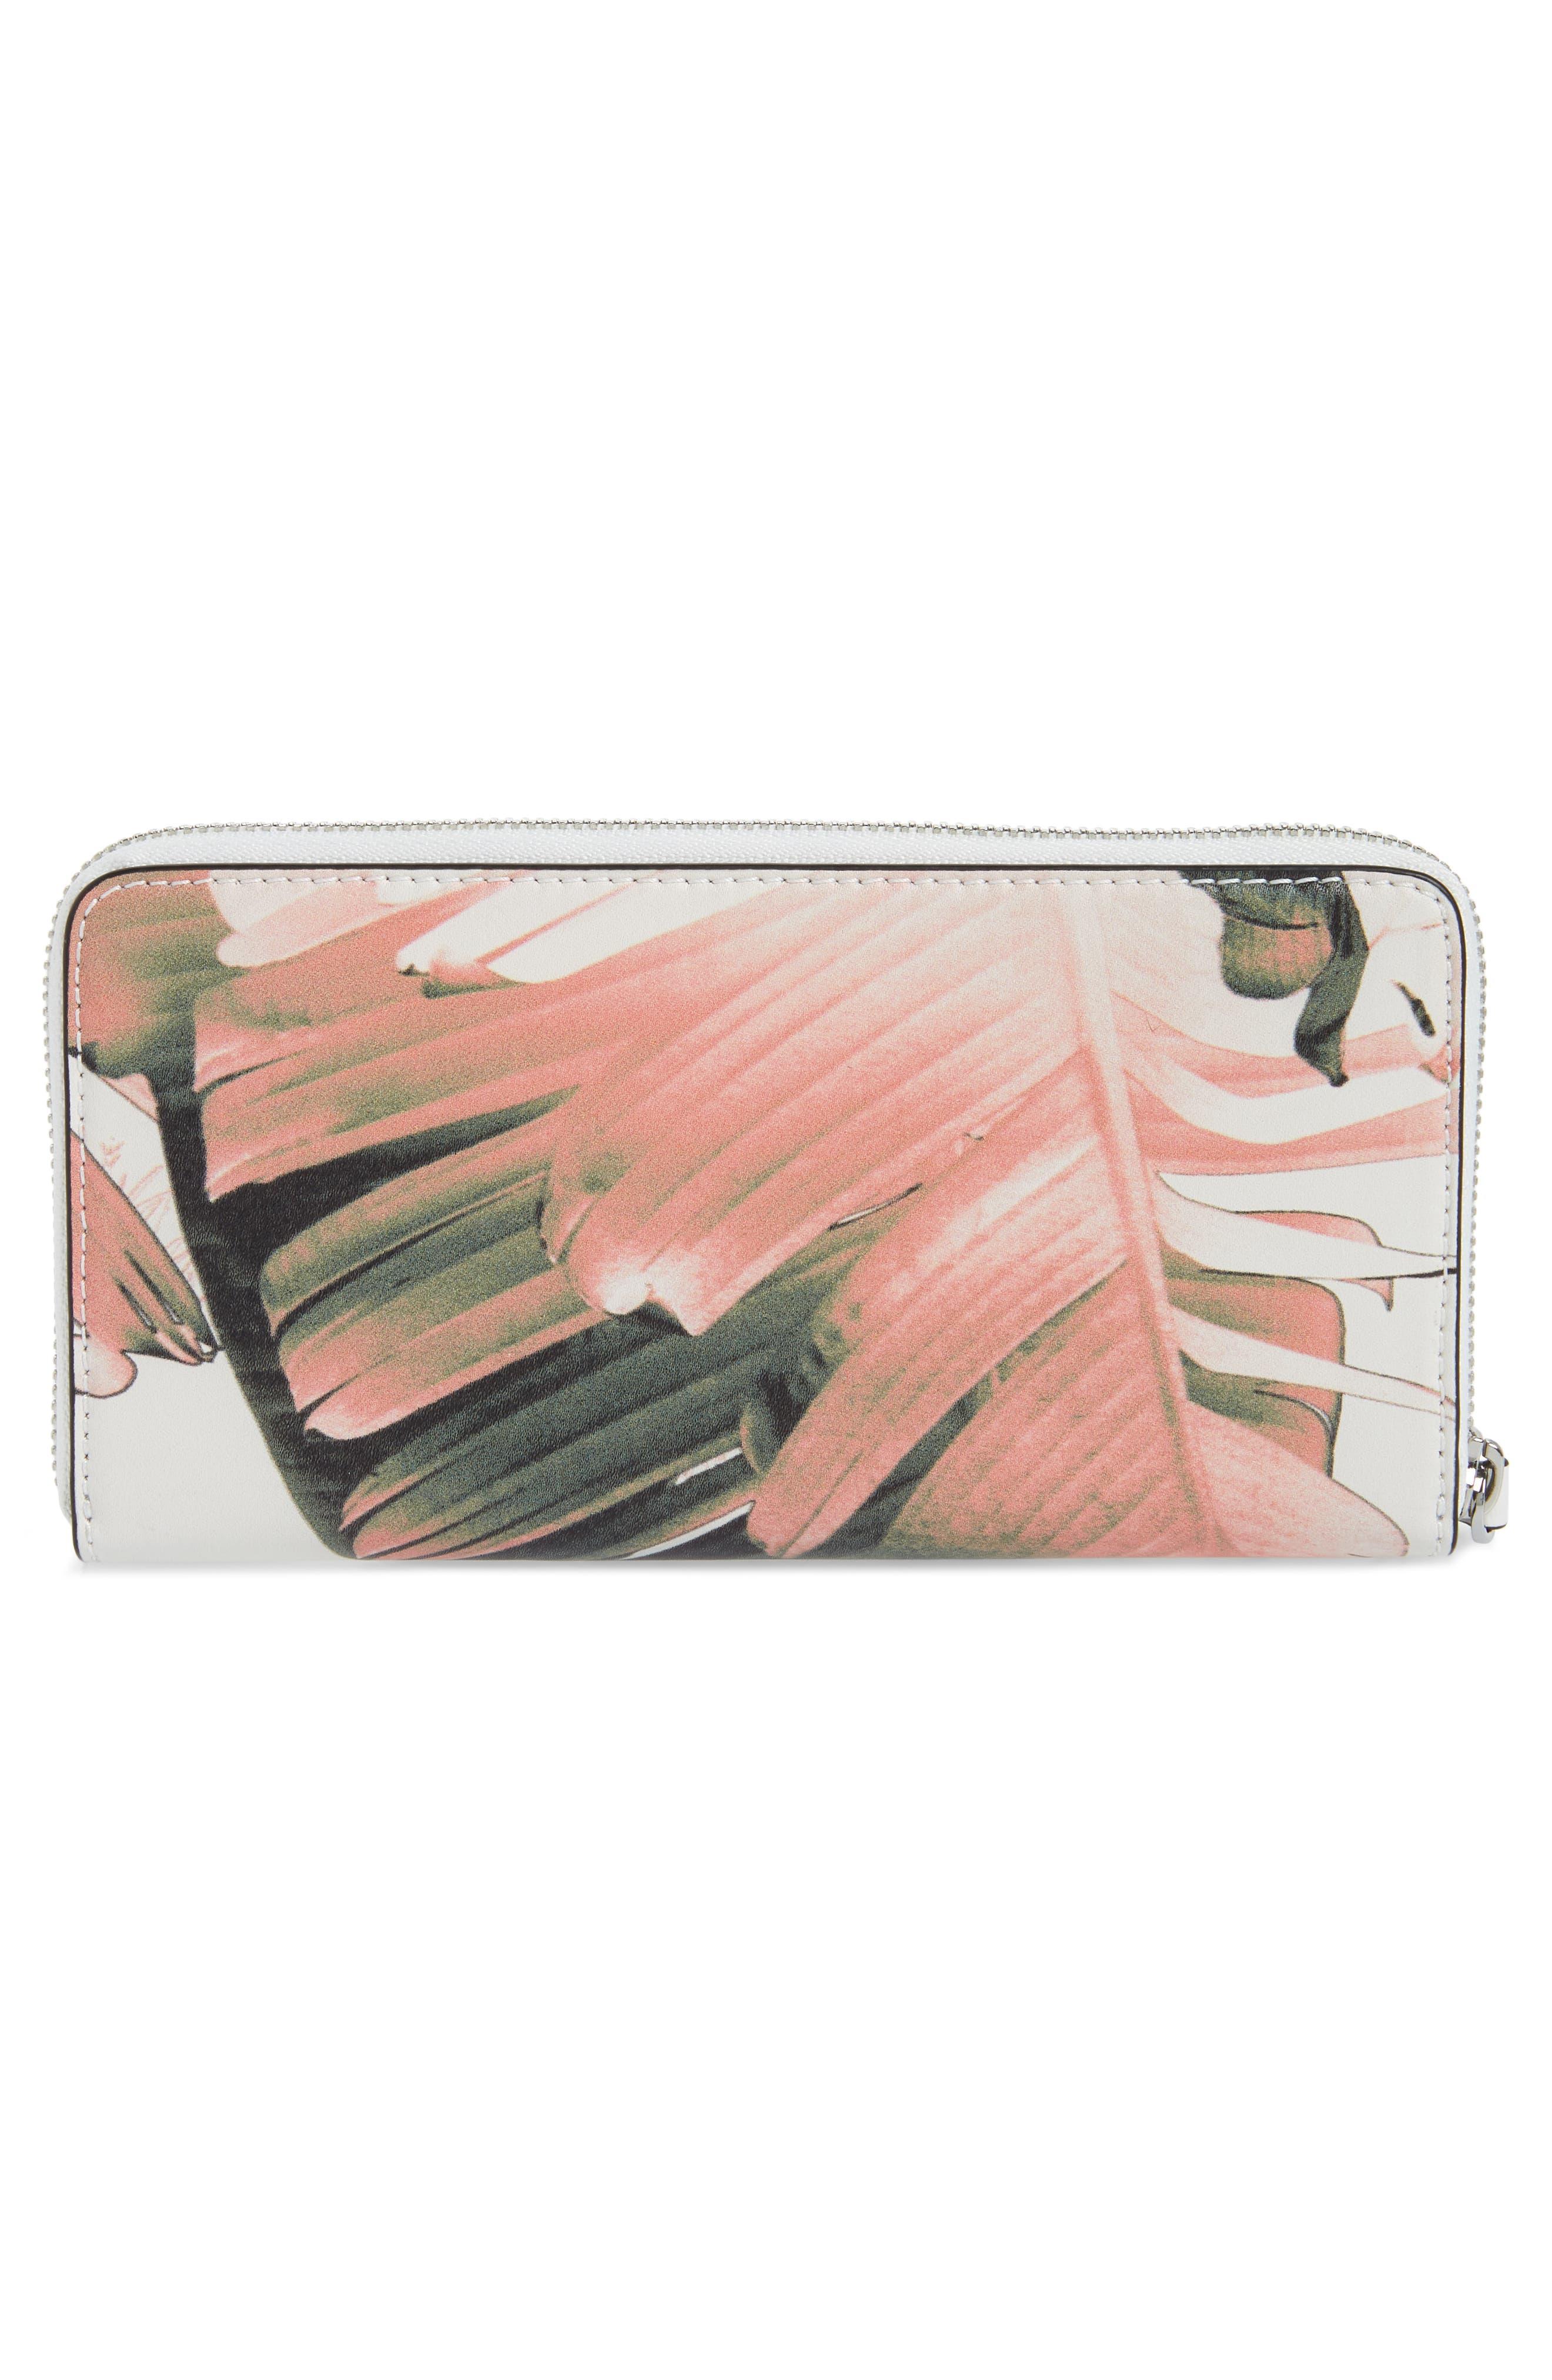 Duke Zip Around Leather Wallet,                             Alternate thumbnail 3, color,                             LEAF